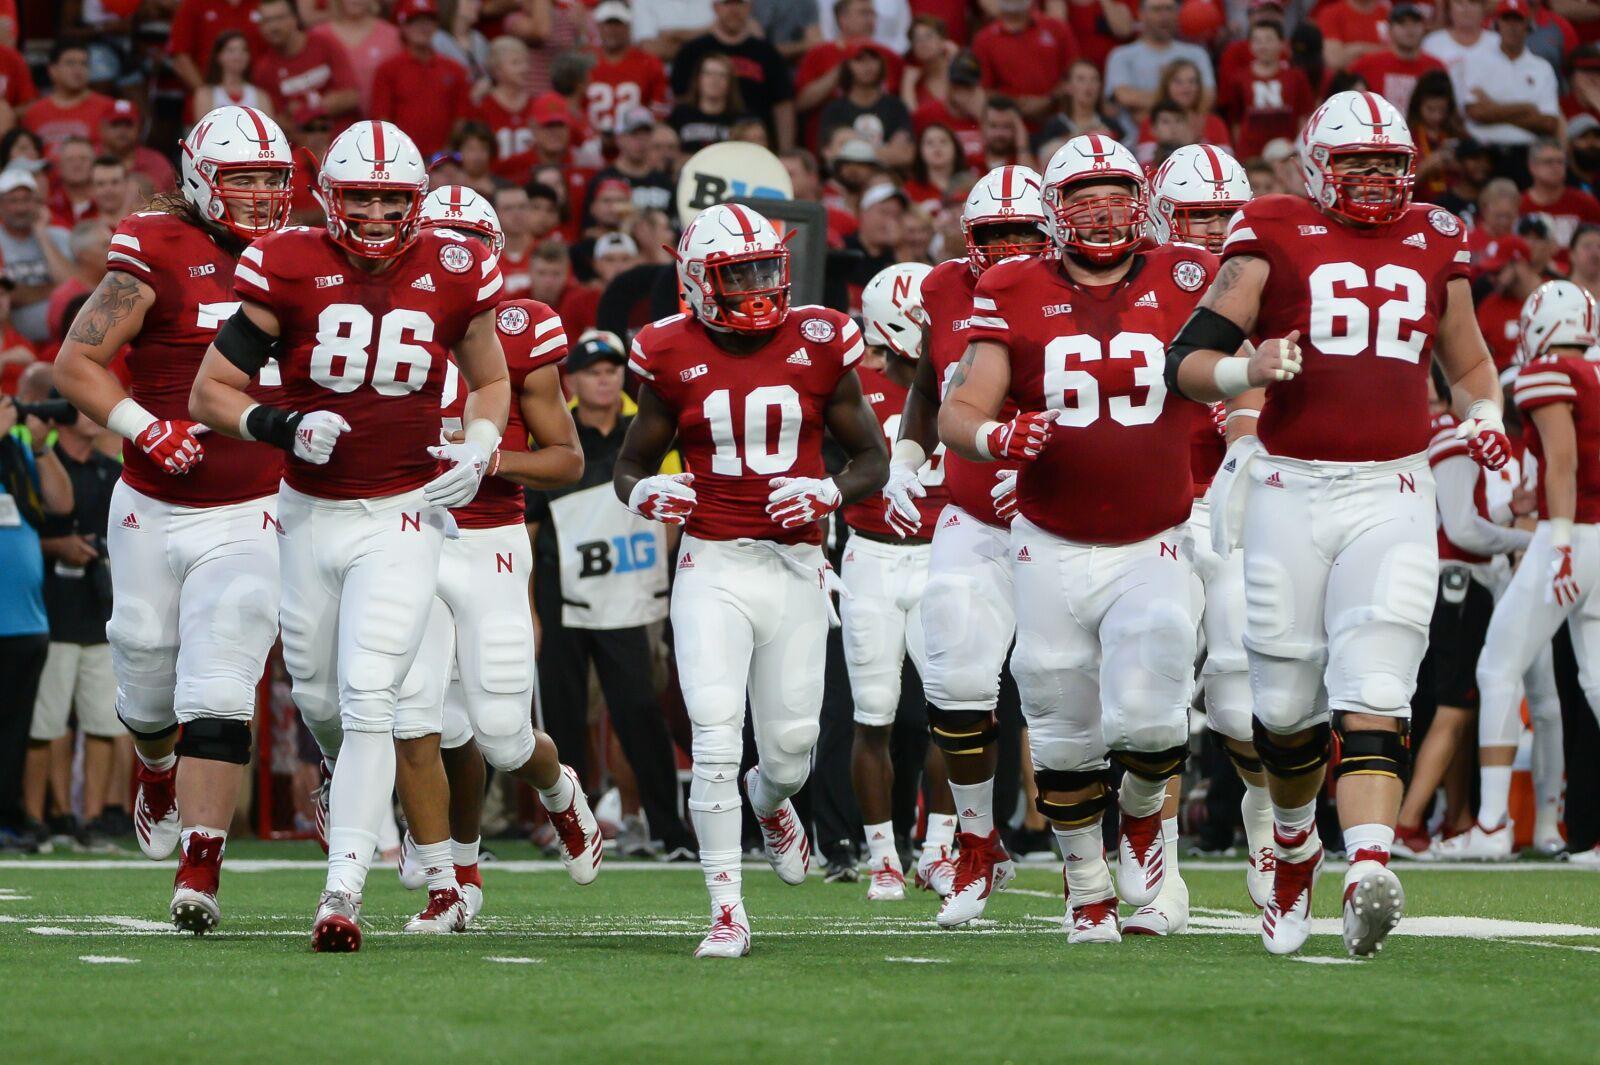 Nebraska Football Five Things To Watch Vs Colorado Buffaloes